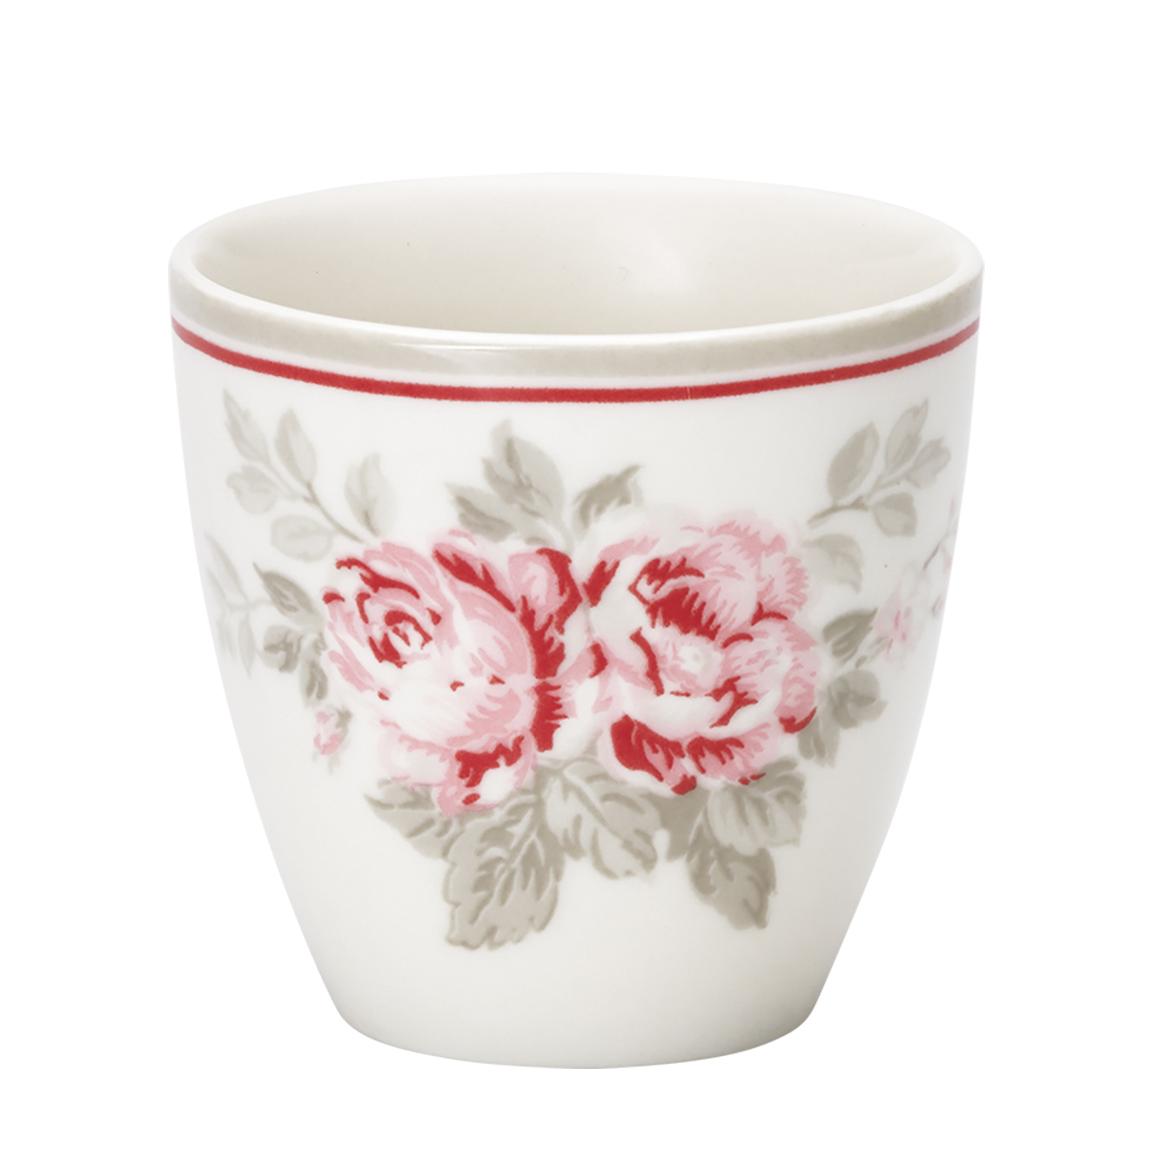 Espressotasse | Mini-Latte Cup - Shirley  linen - Greengate